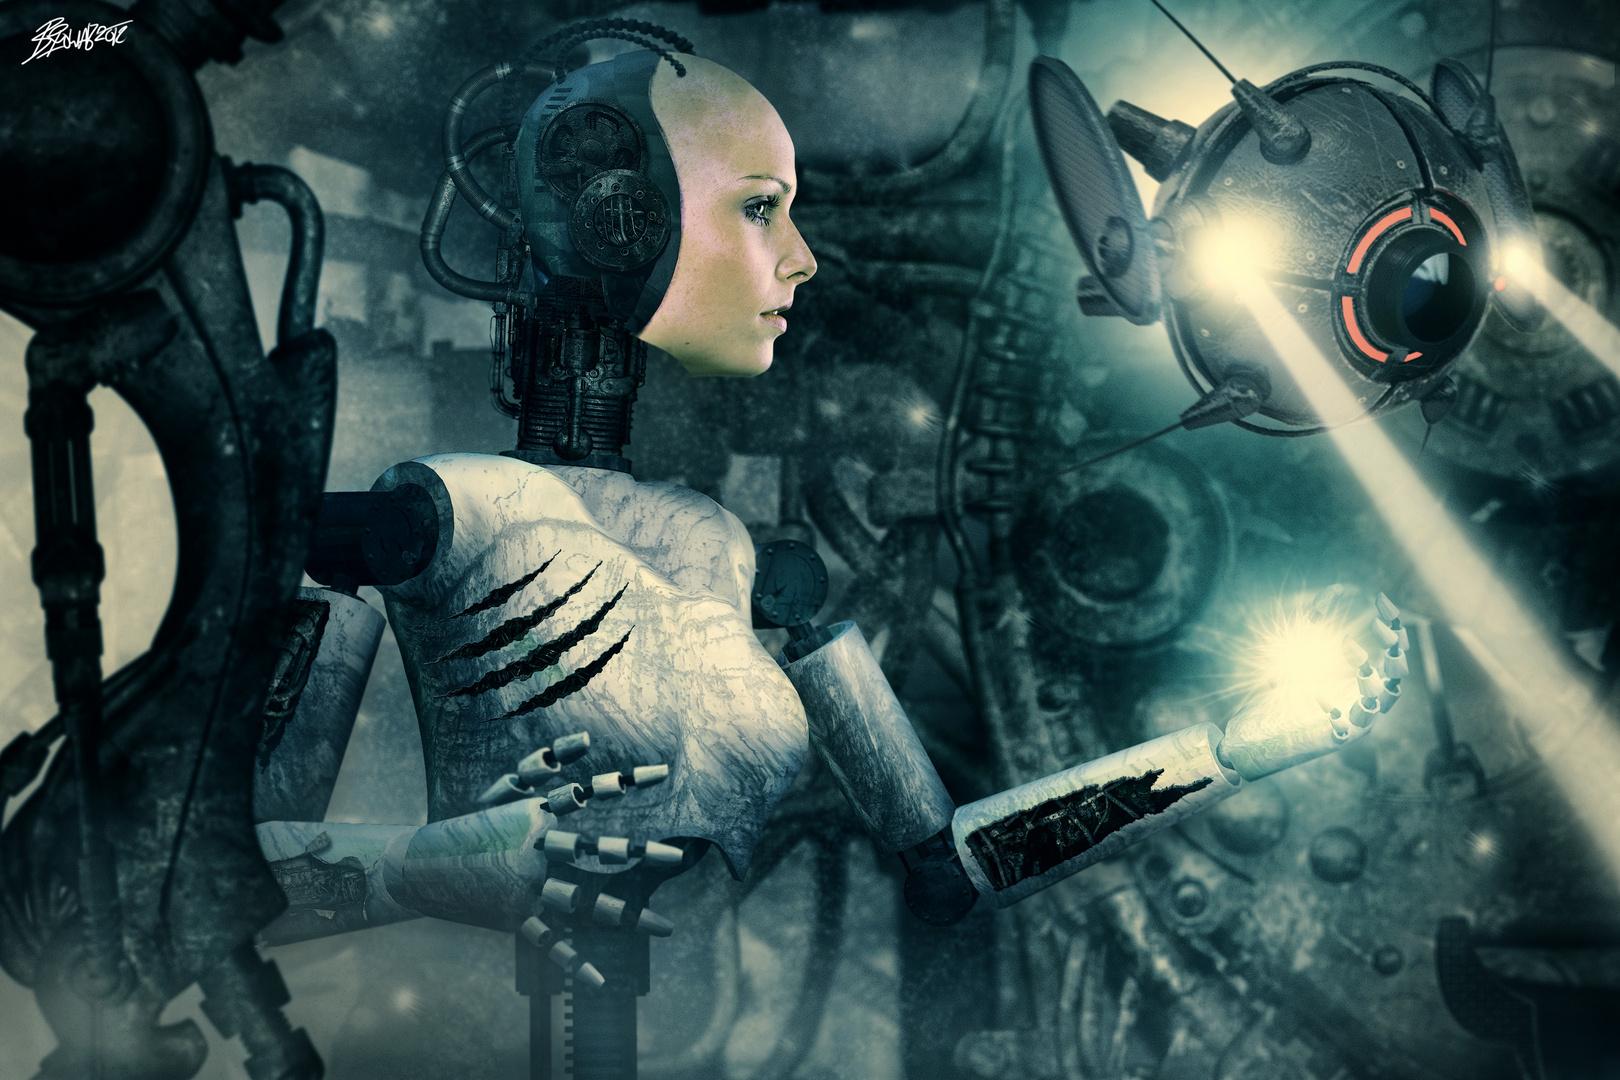 Adventures of Fem:bot